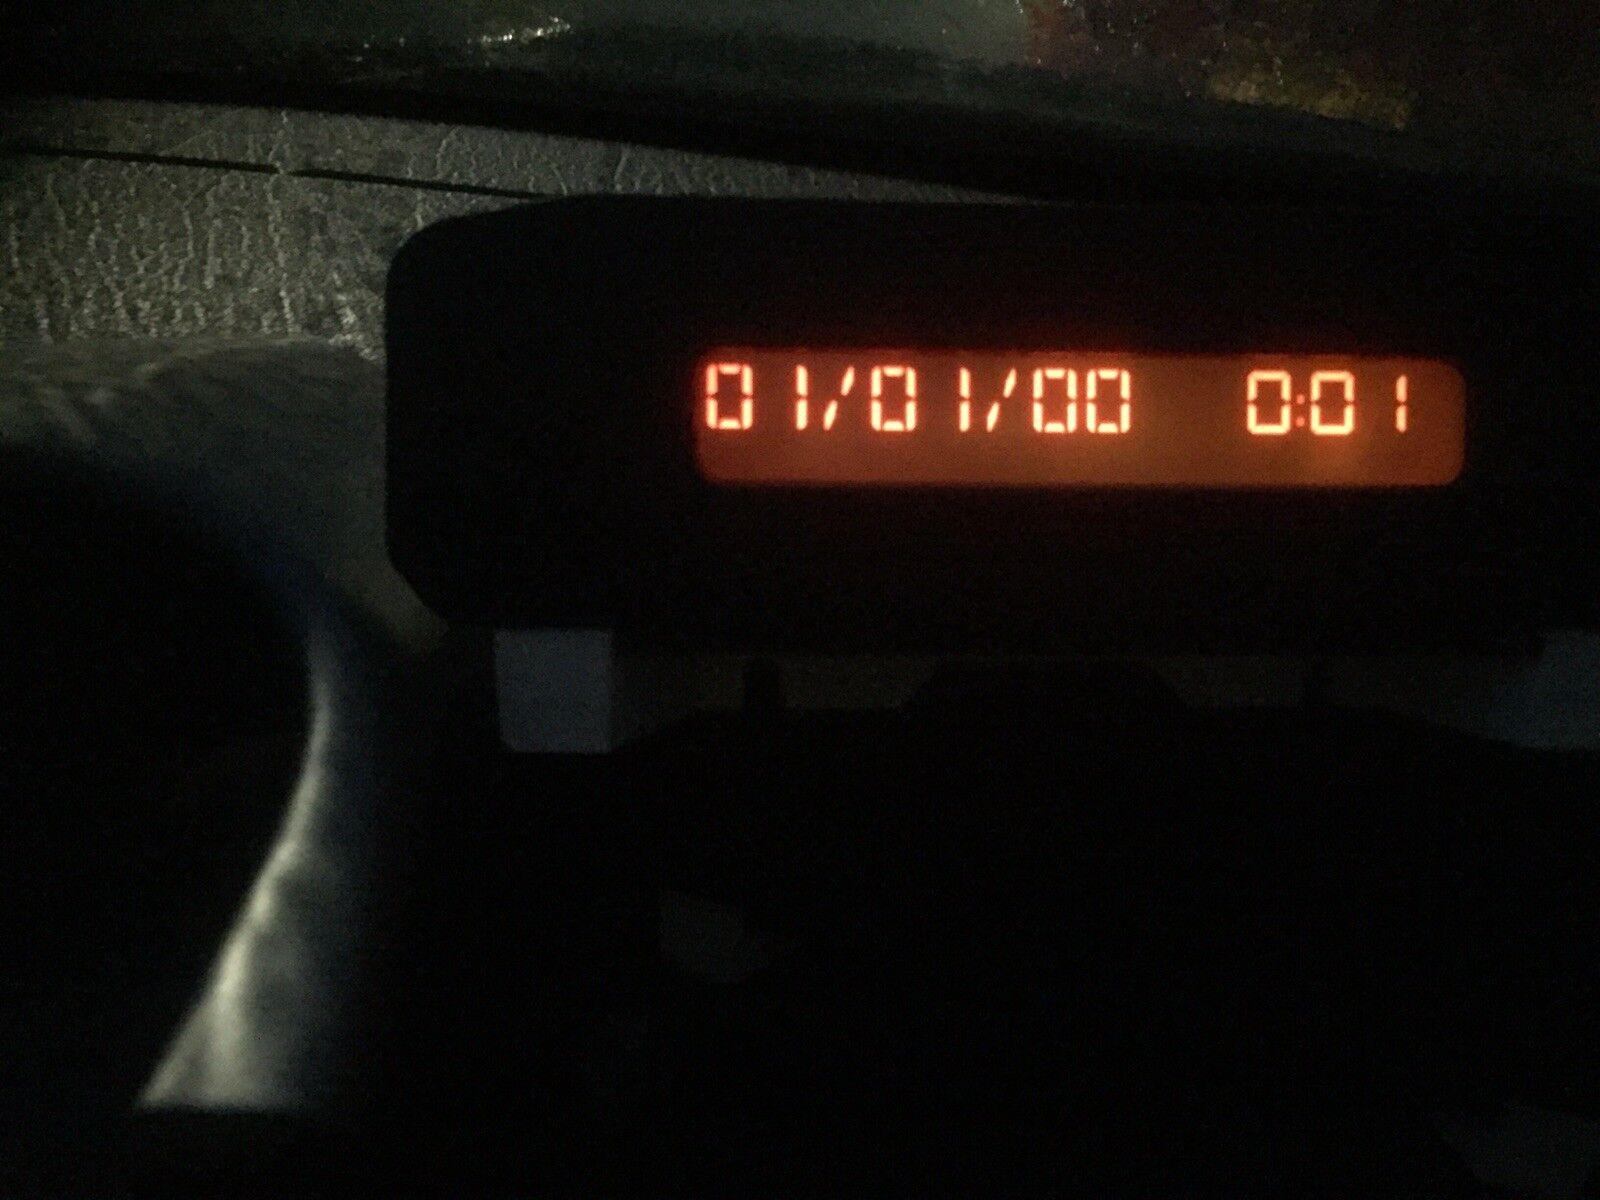 PEUGEOT 206 DASHBOARD DISPLAY INFO SCREEN CLOCK 96564642XT